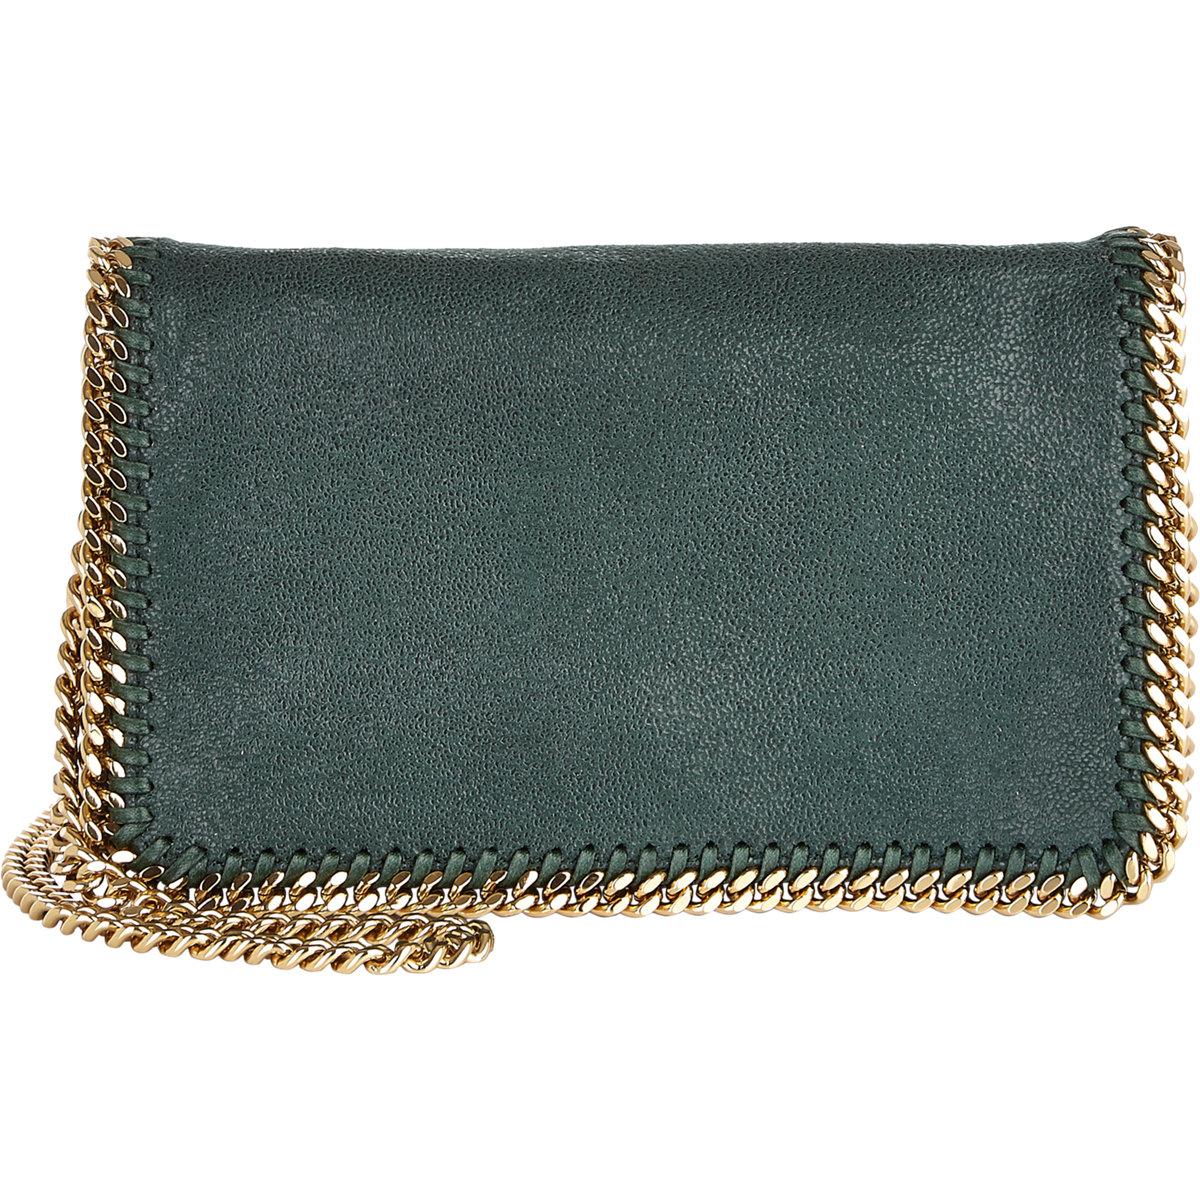 586e7f399c Gallery. Previously sold at  Barneys New York · Women s Stella Mccartney  Falabella Women s Velvet Shoulder Bags ...